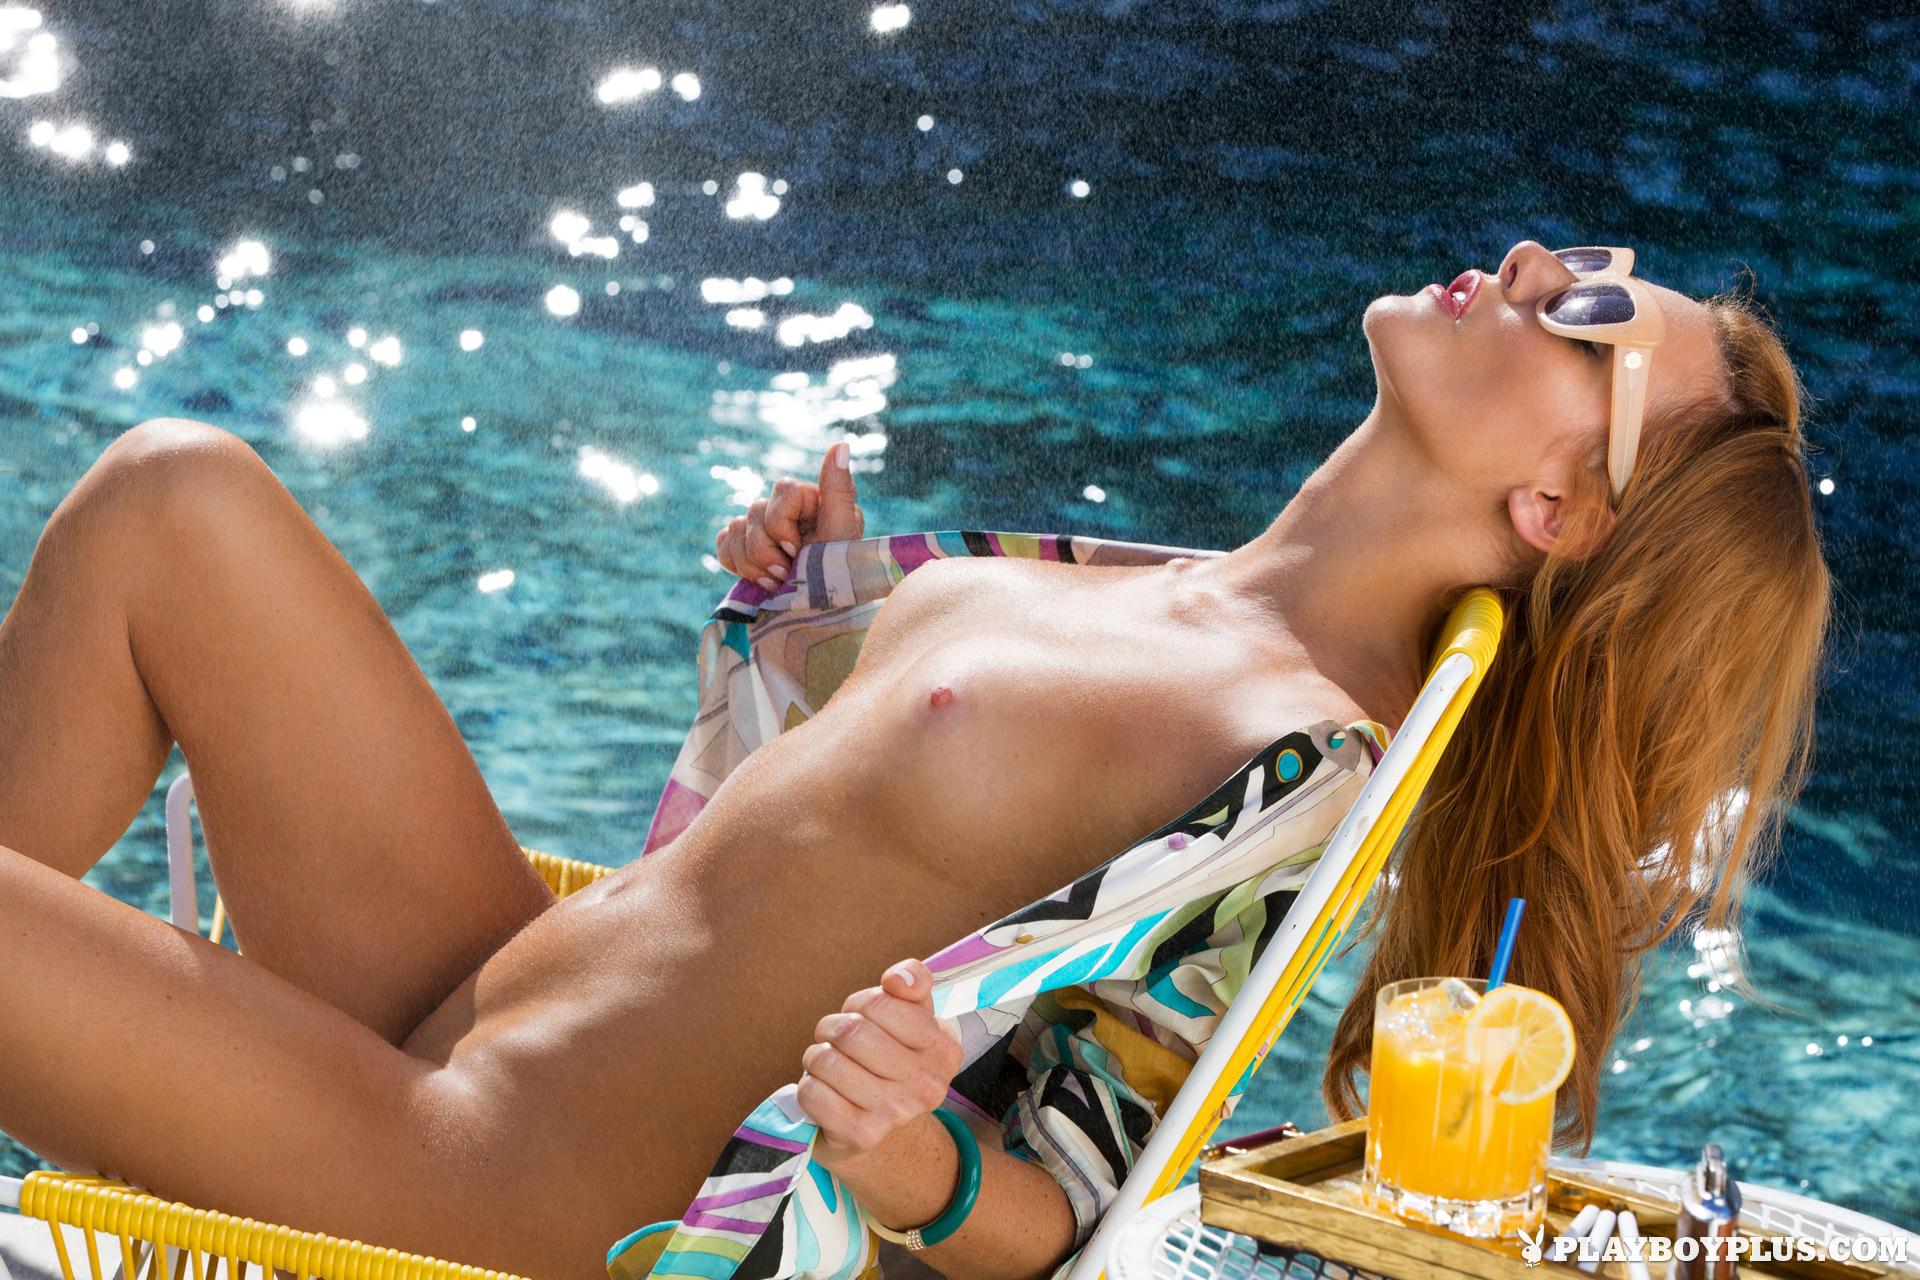 gia-marie-pool-wet-naked-sunglasses-playboy-04